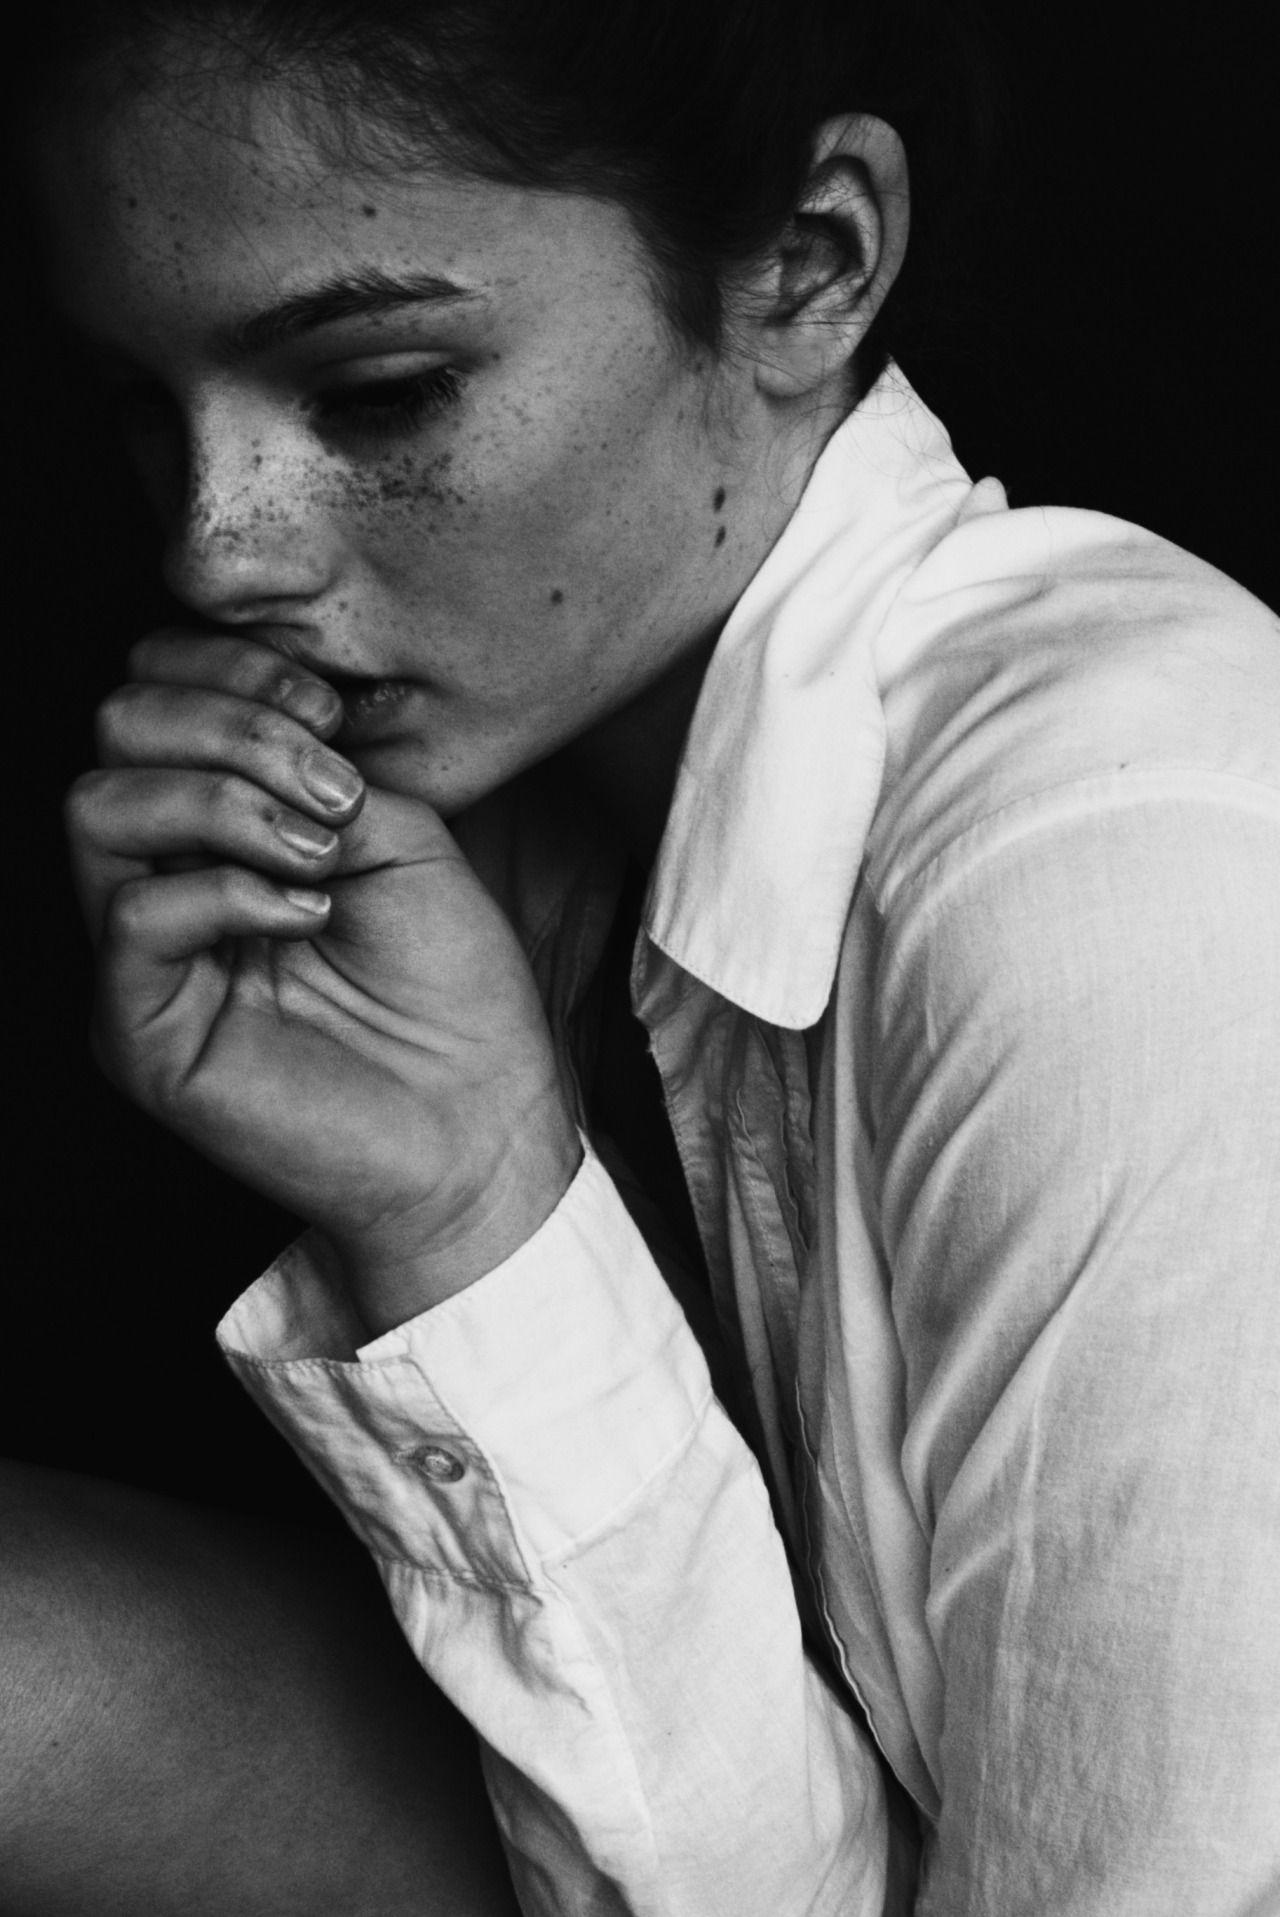 Selfie Chanel Asberg nudes (99 photo), Pussy, Hot, Feet, underwear 2020